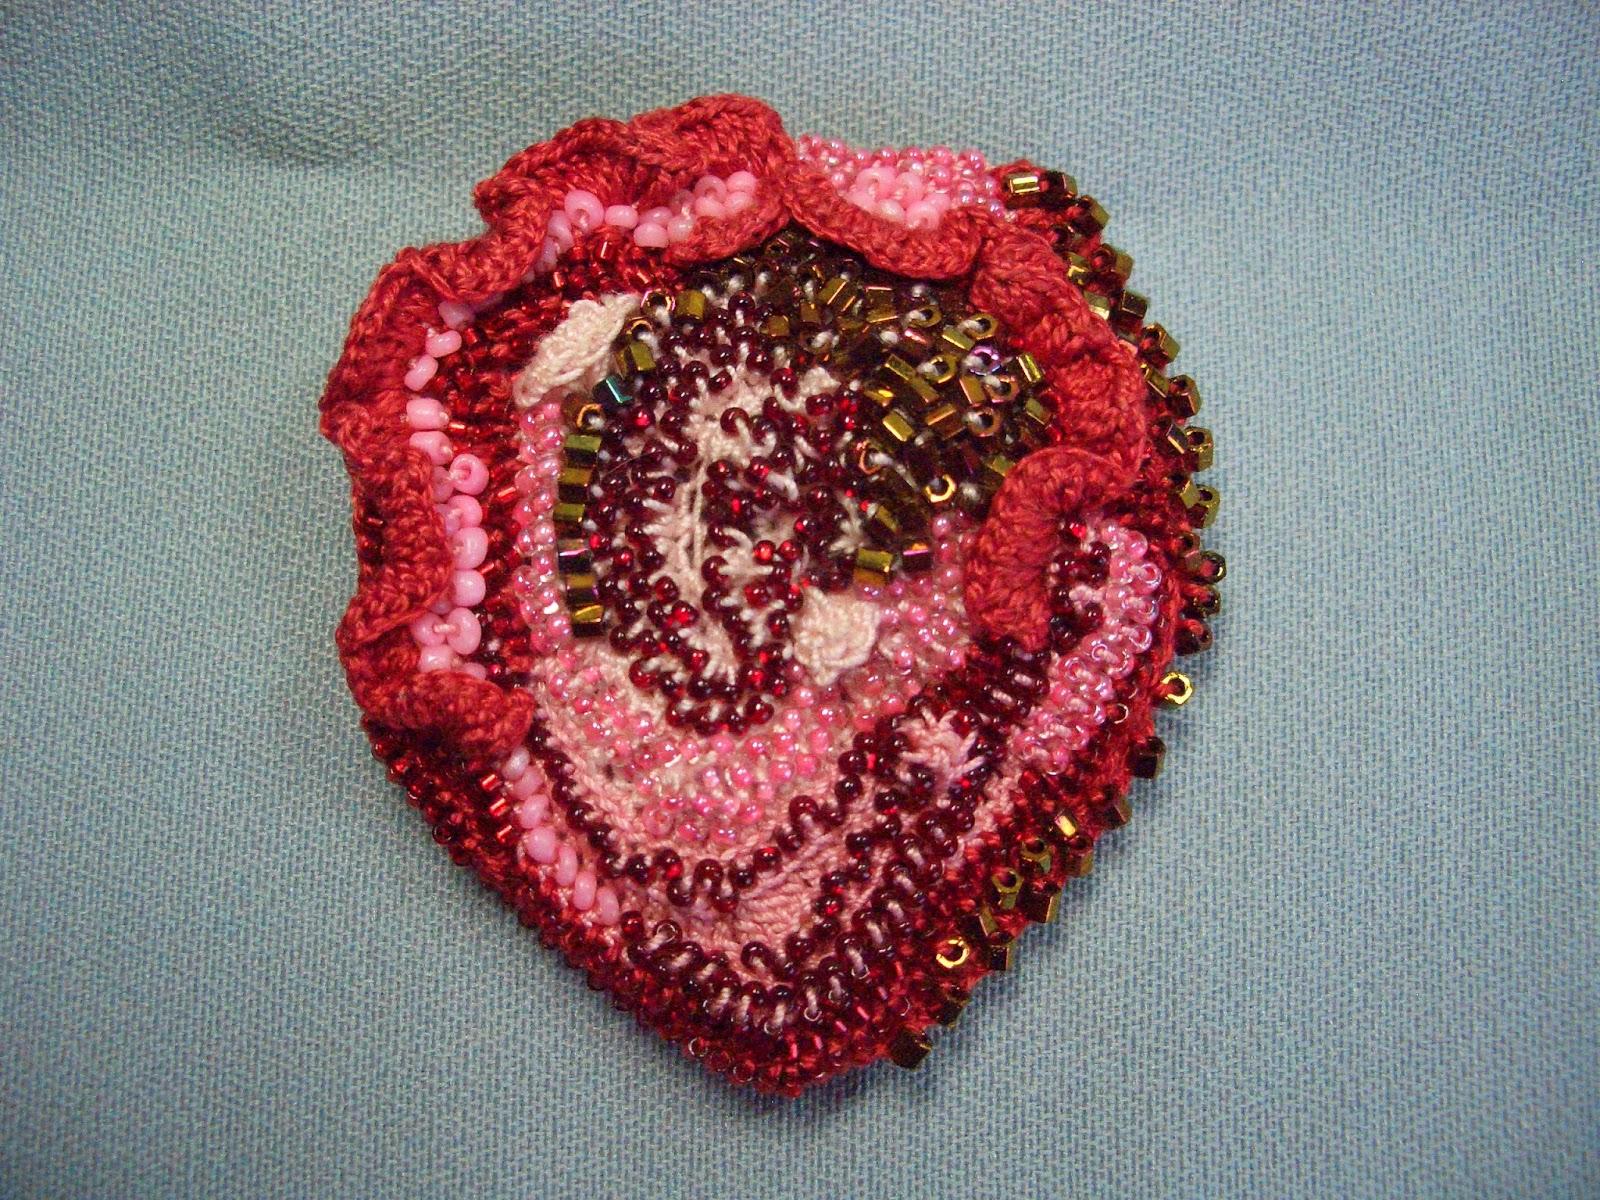 Crochet Queen : Crochet Queen: Royal Ramblings: What is Free Form Crochet?